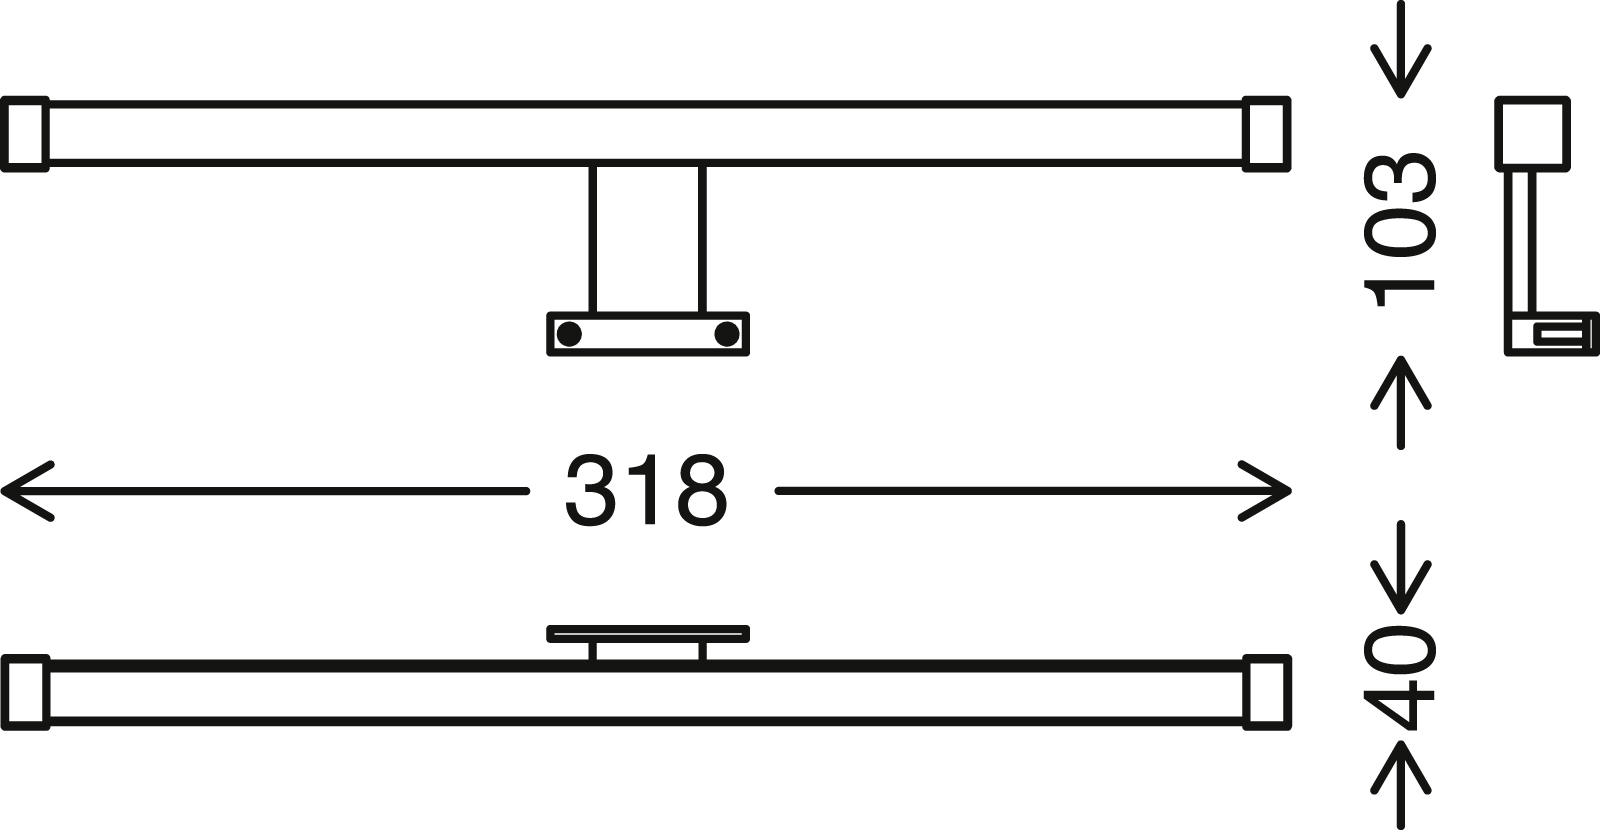 LED Spiegelleuchte, 31,8 cm, 8 W, Chrom